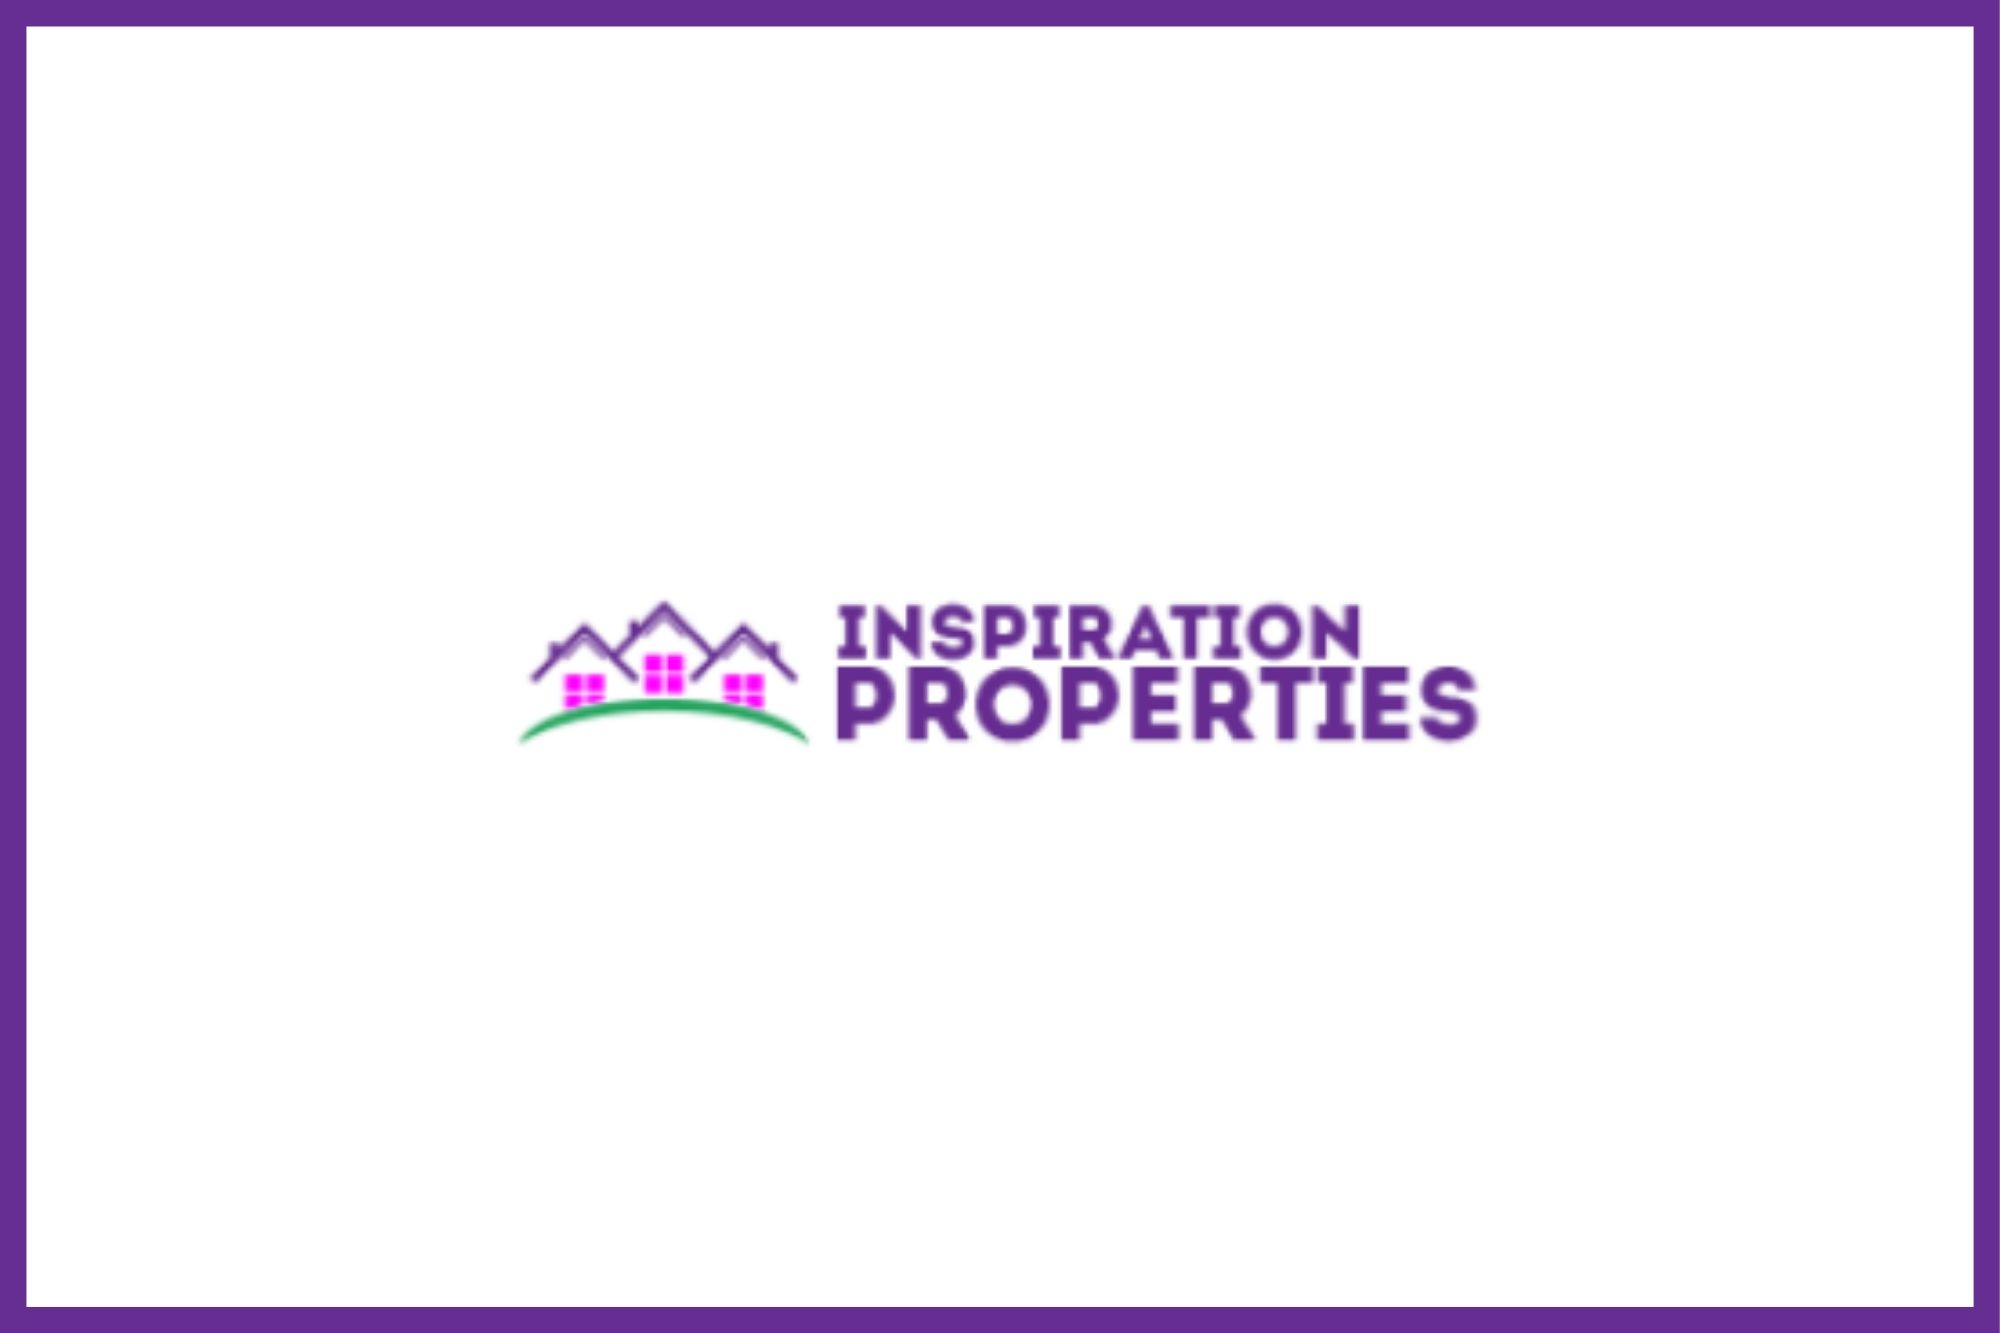 Inspiration Properties Ltd